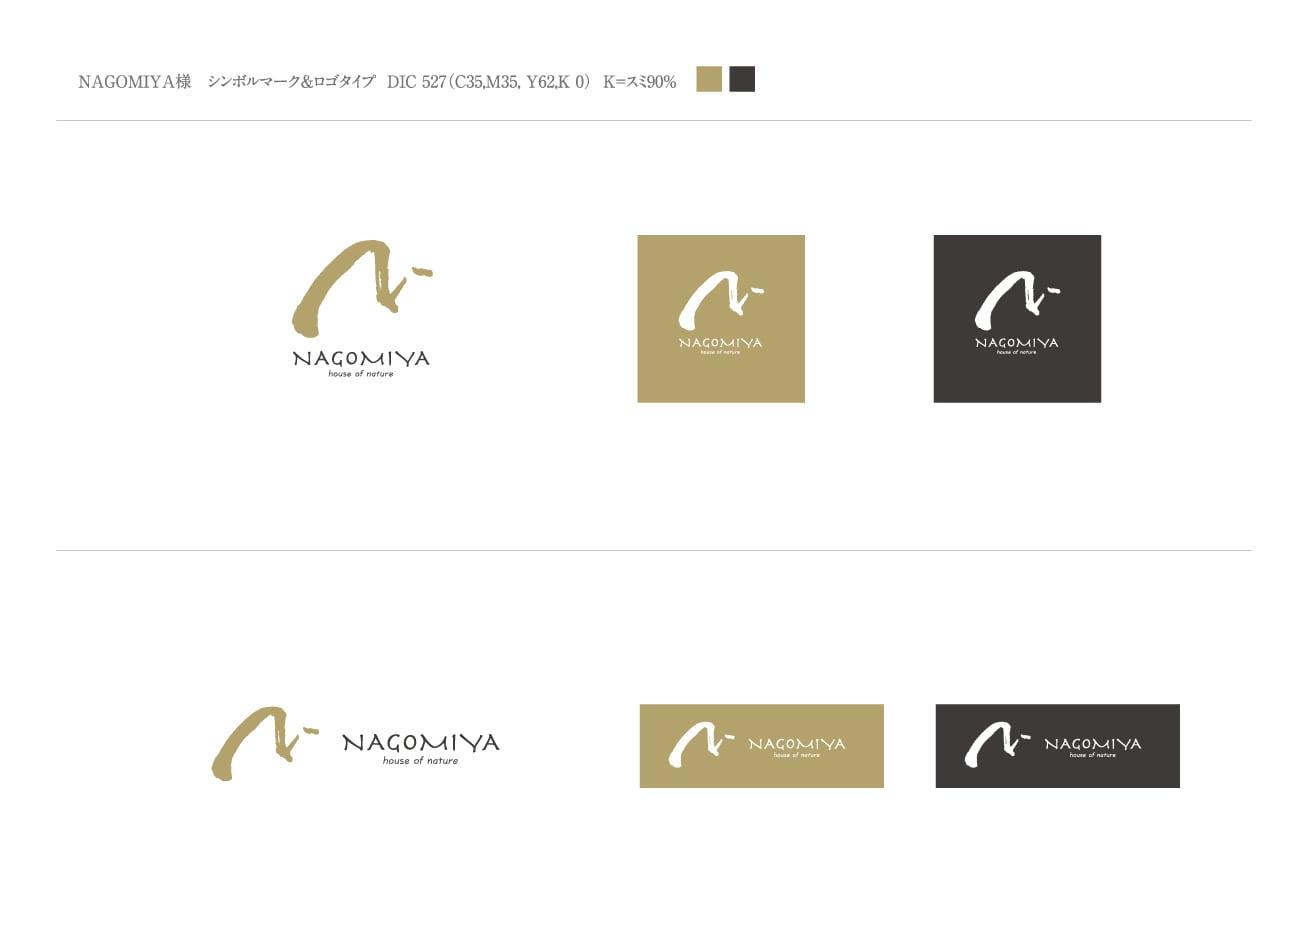 NAGOMIYAのロゴ2